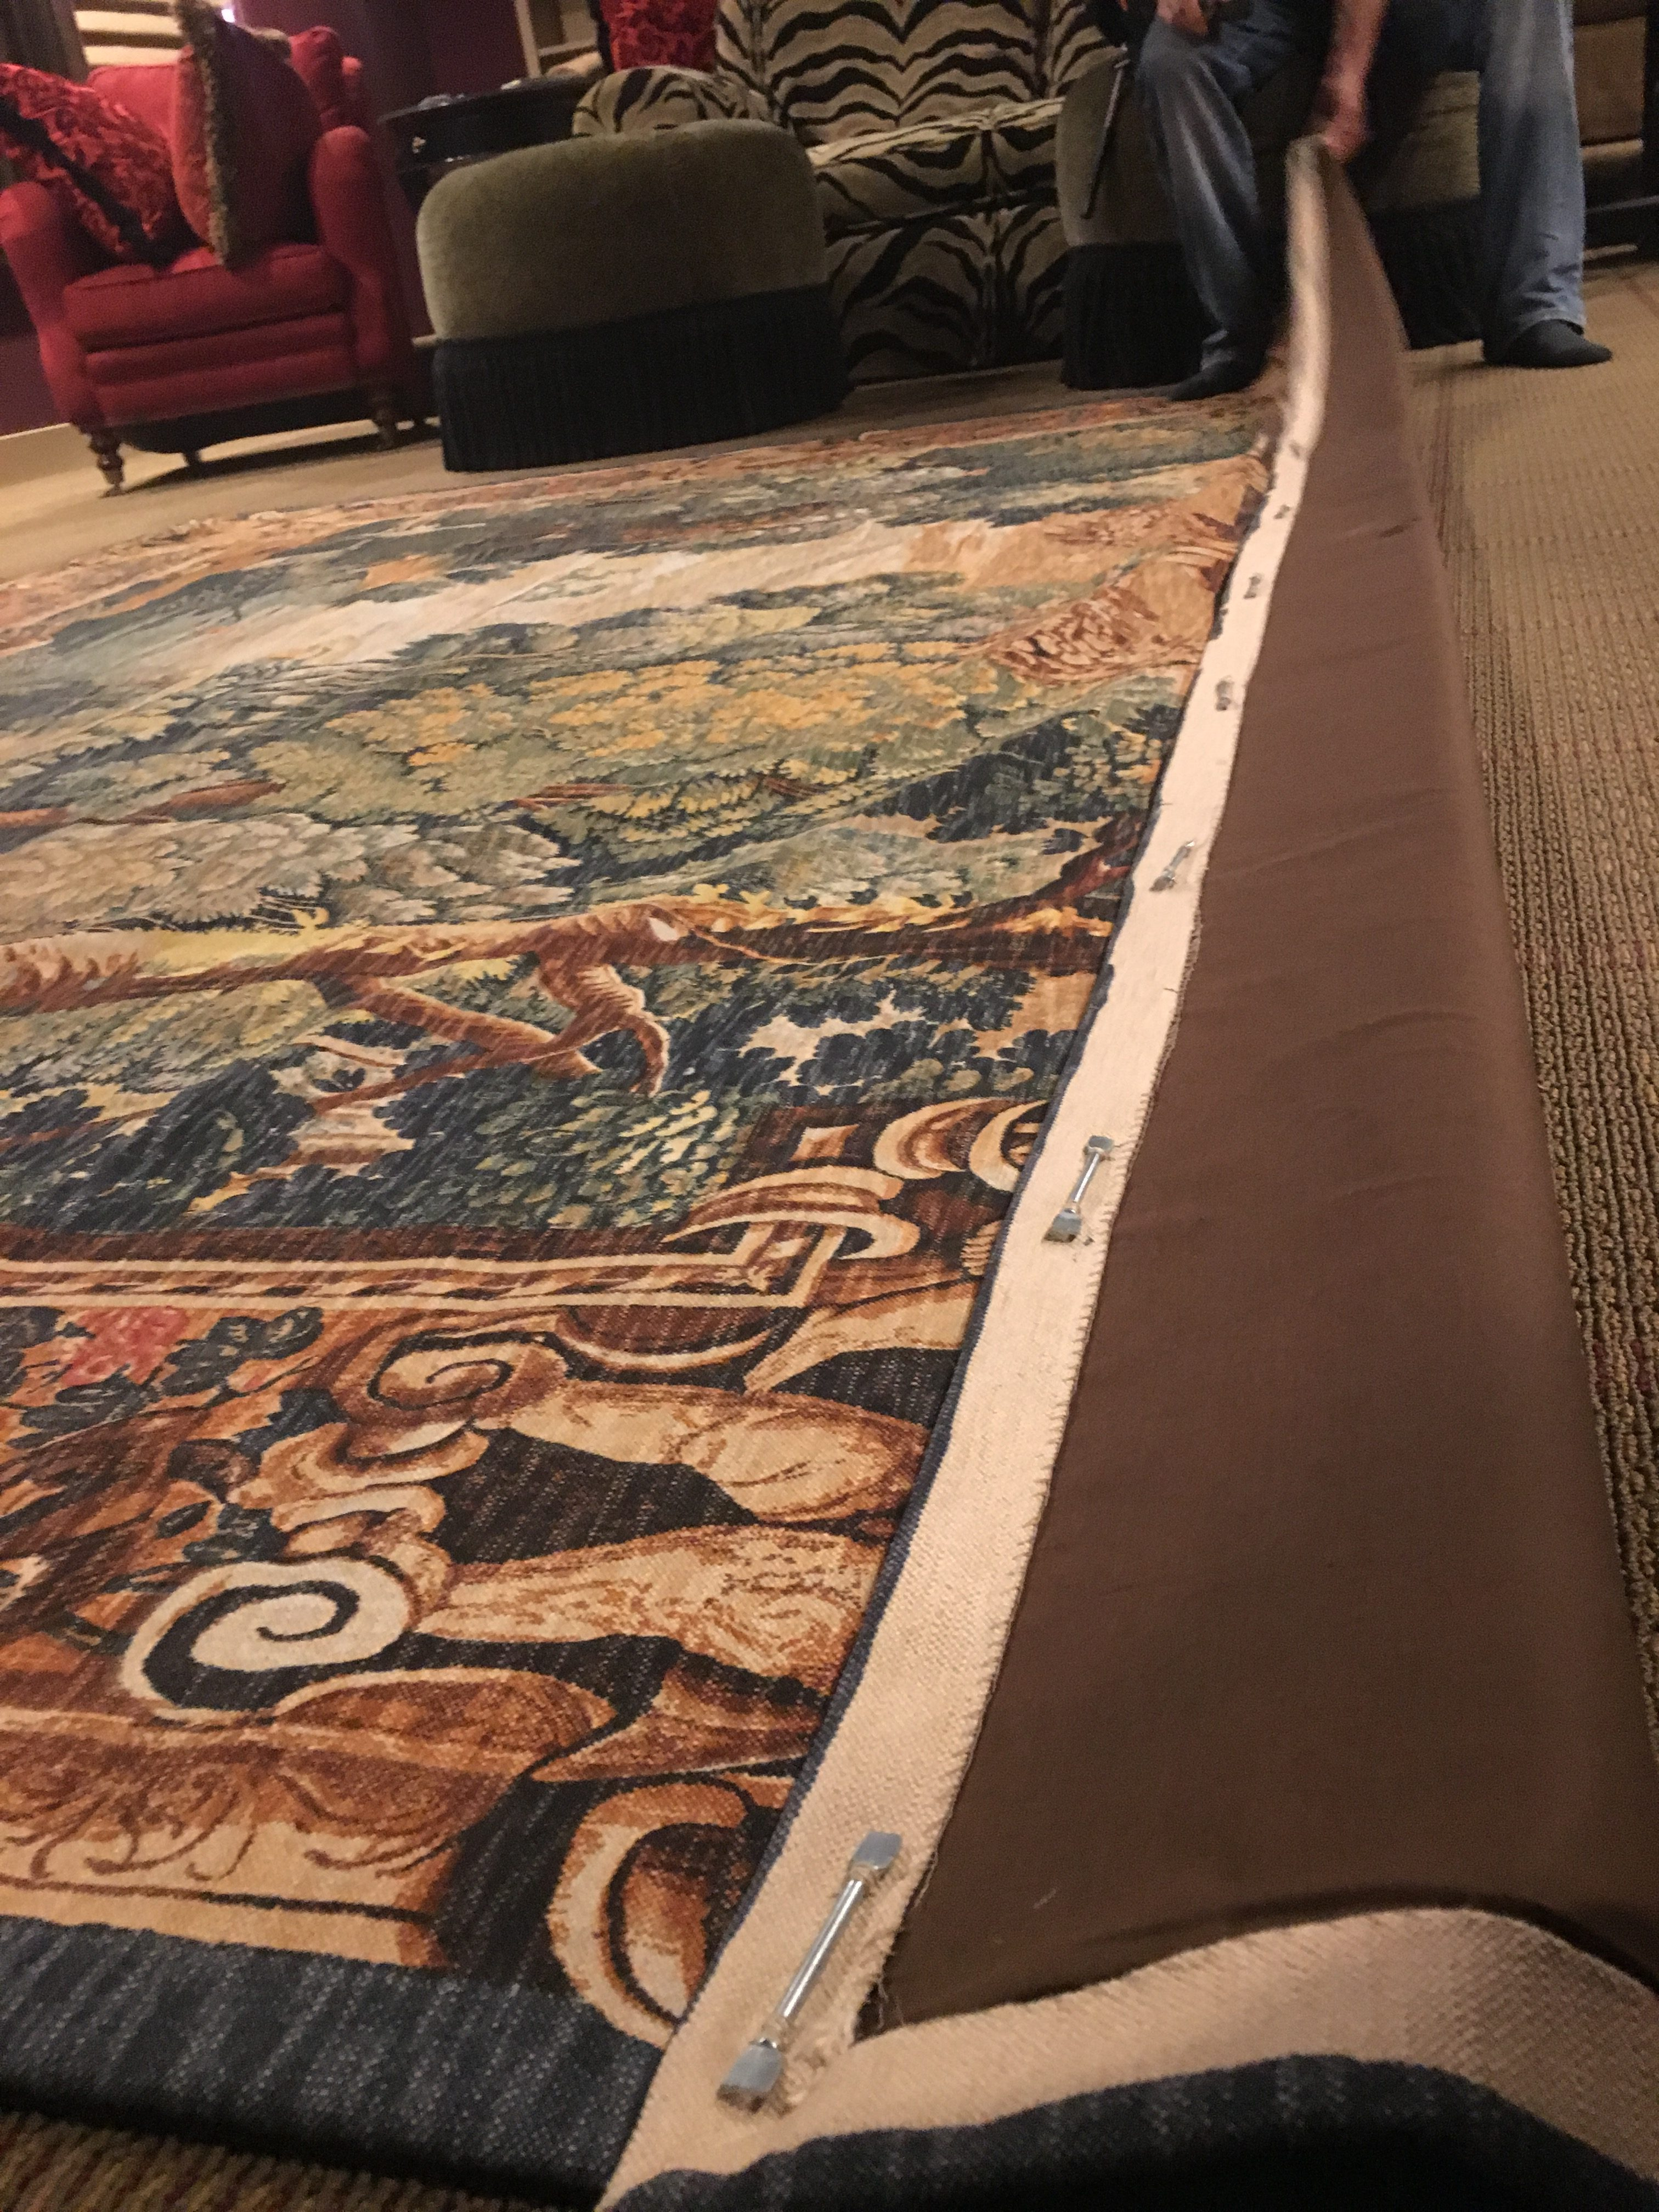 Tapestry, Art Hanging, Austin, Texas